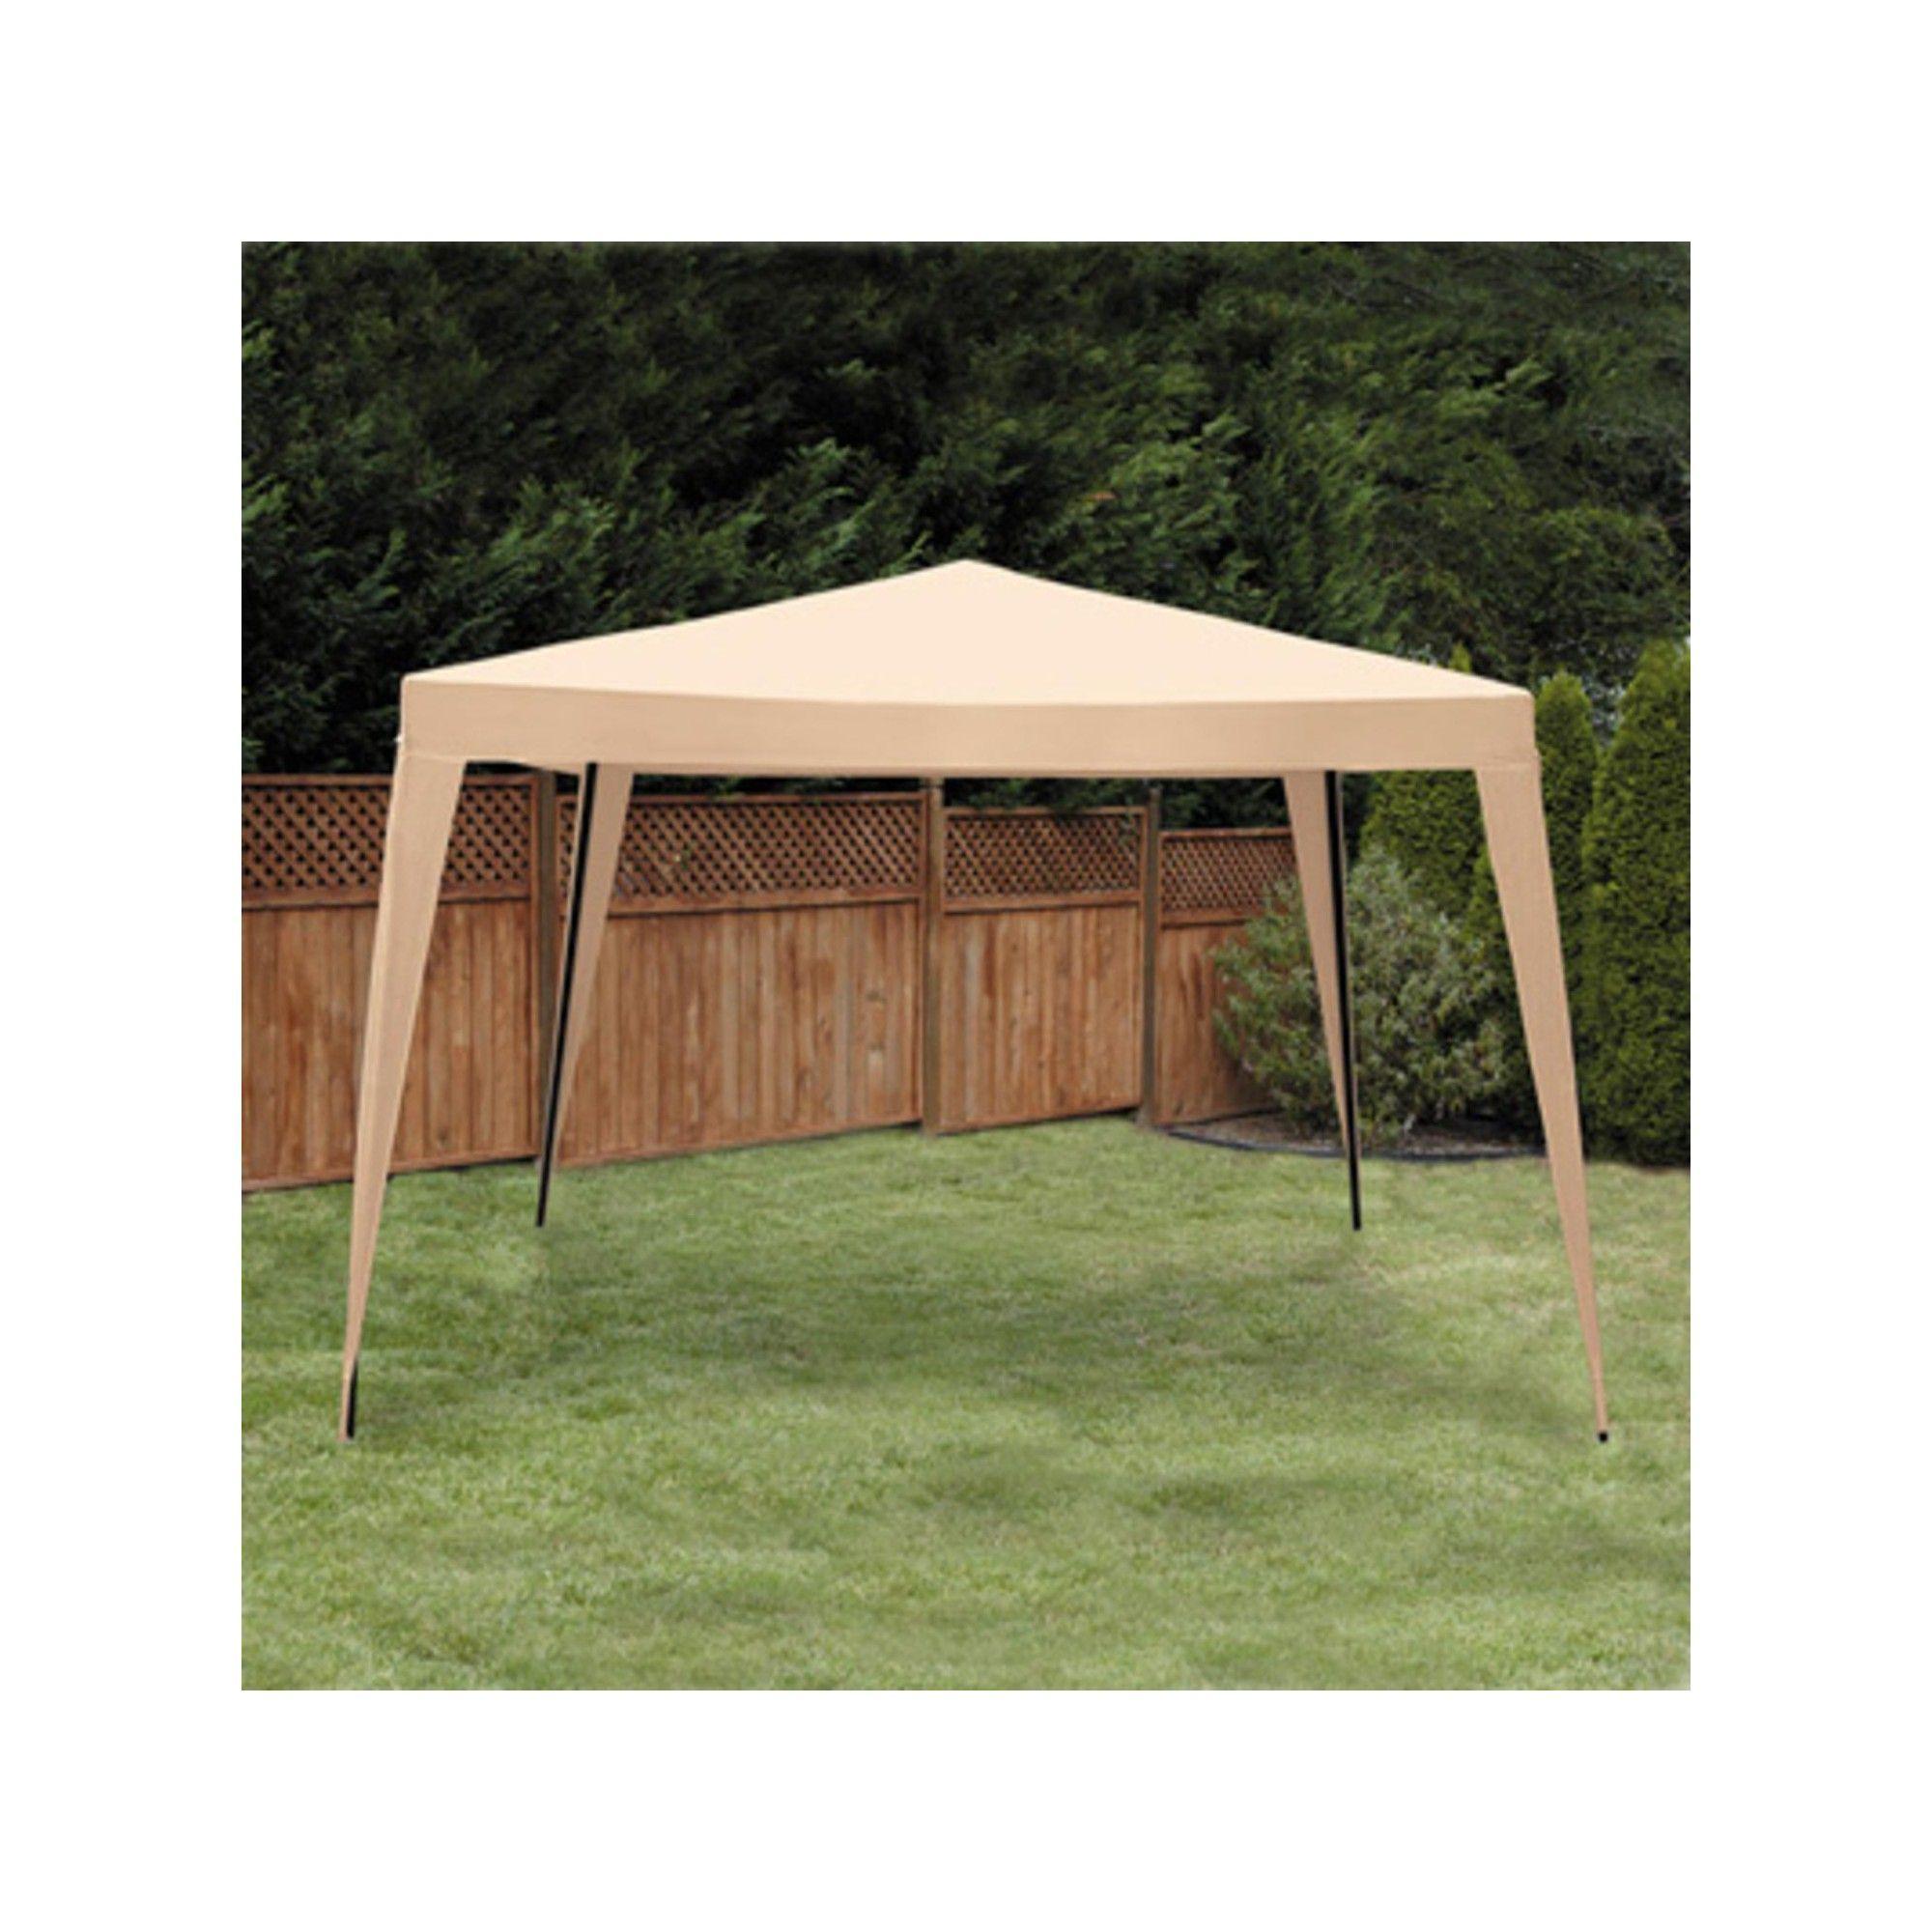 Lb International 10 X 10 Pop Up Outdoor Garden Gazebo Party Tent Canopy Tan In 2020 Gazebo Backyard Gazebo Screened Gazebo